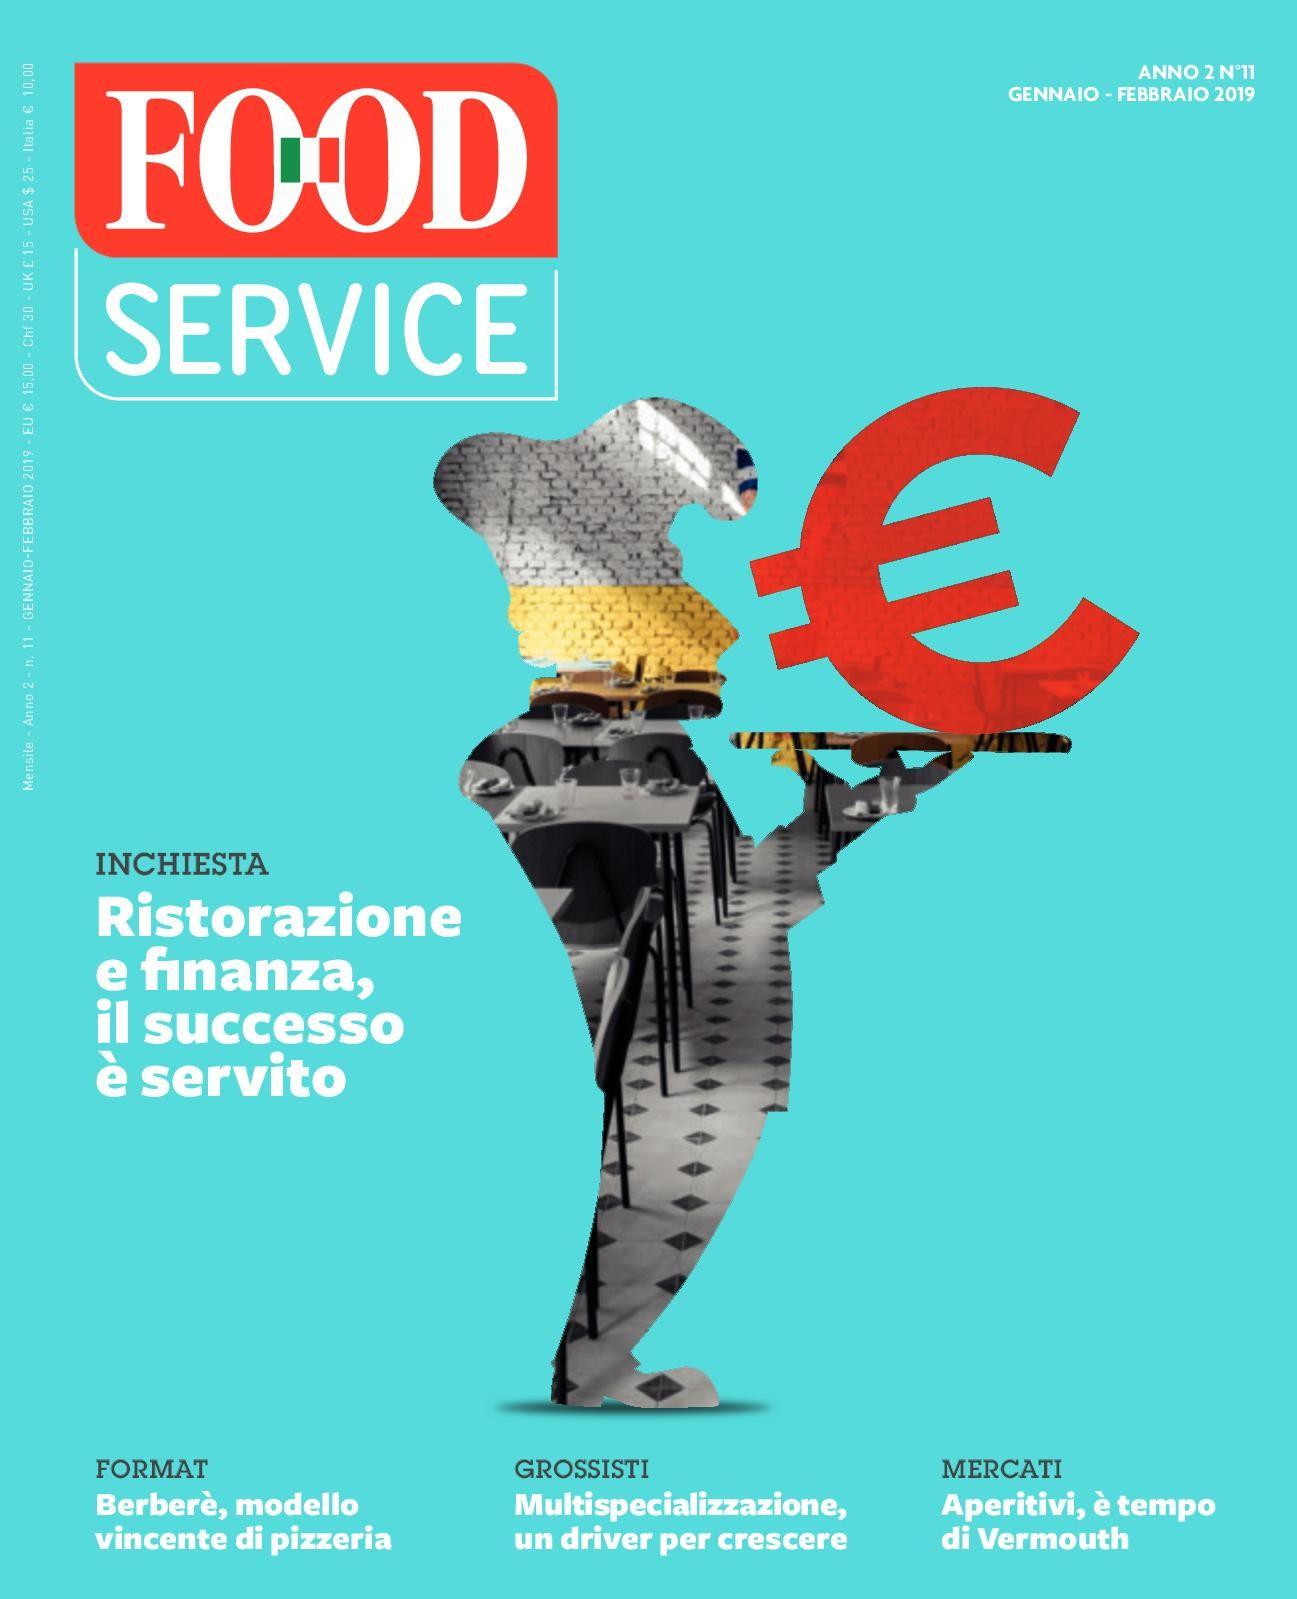 Calendario Romano 2020 Kaufen Más Arriba-a-fecha Calaméo Food Service Gennaio 2019 Sfogliabile Pleto Of Calendario Romano 2020 Kaufen Más Populares events